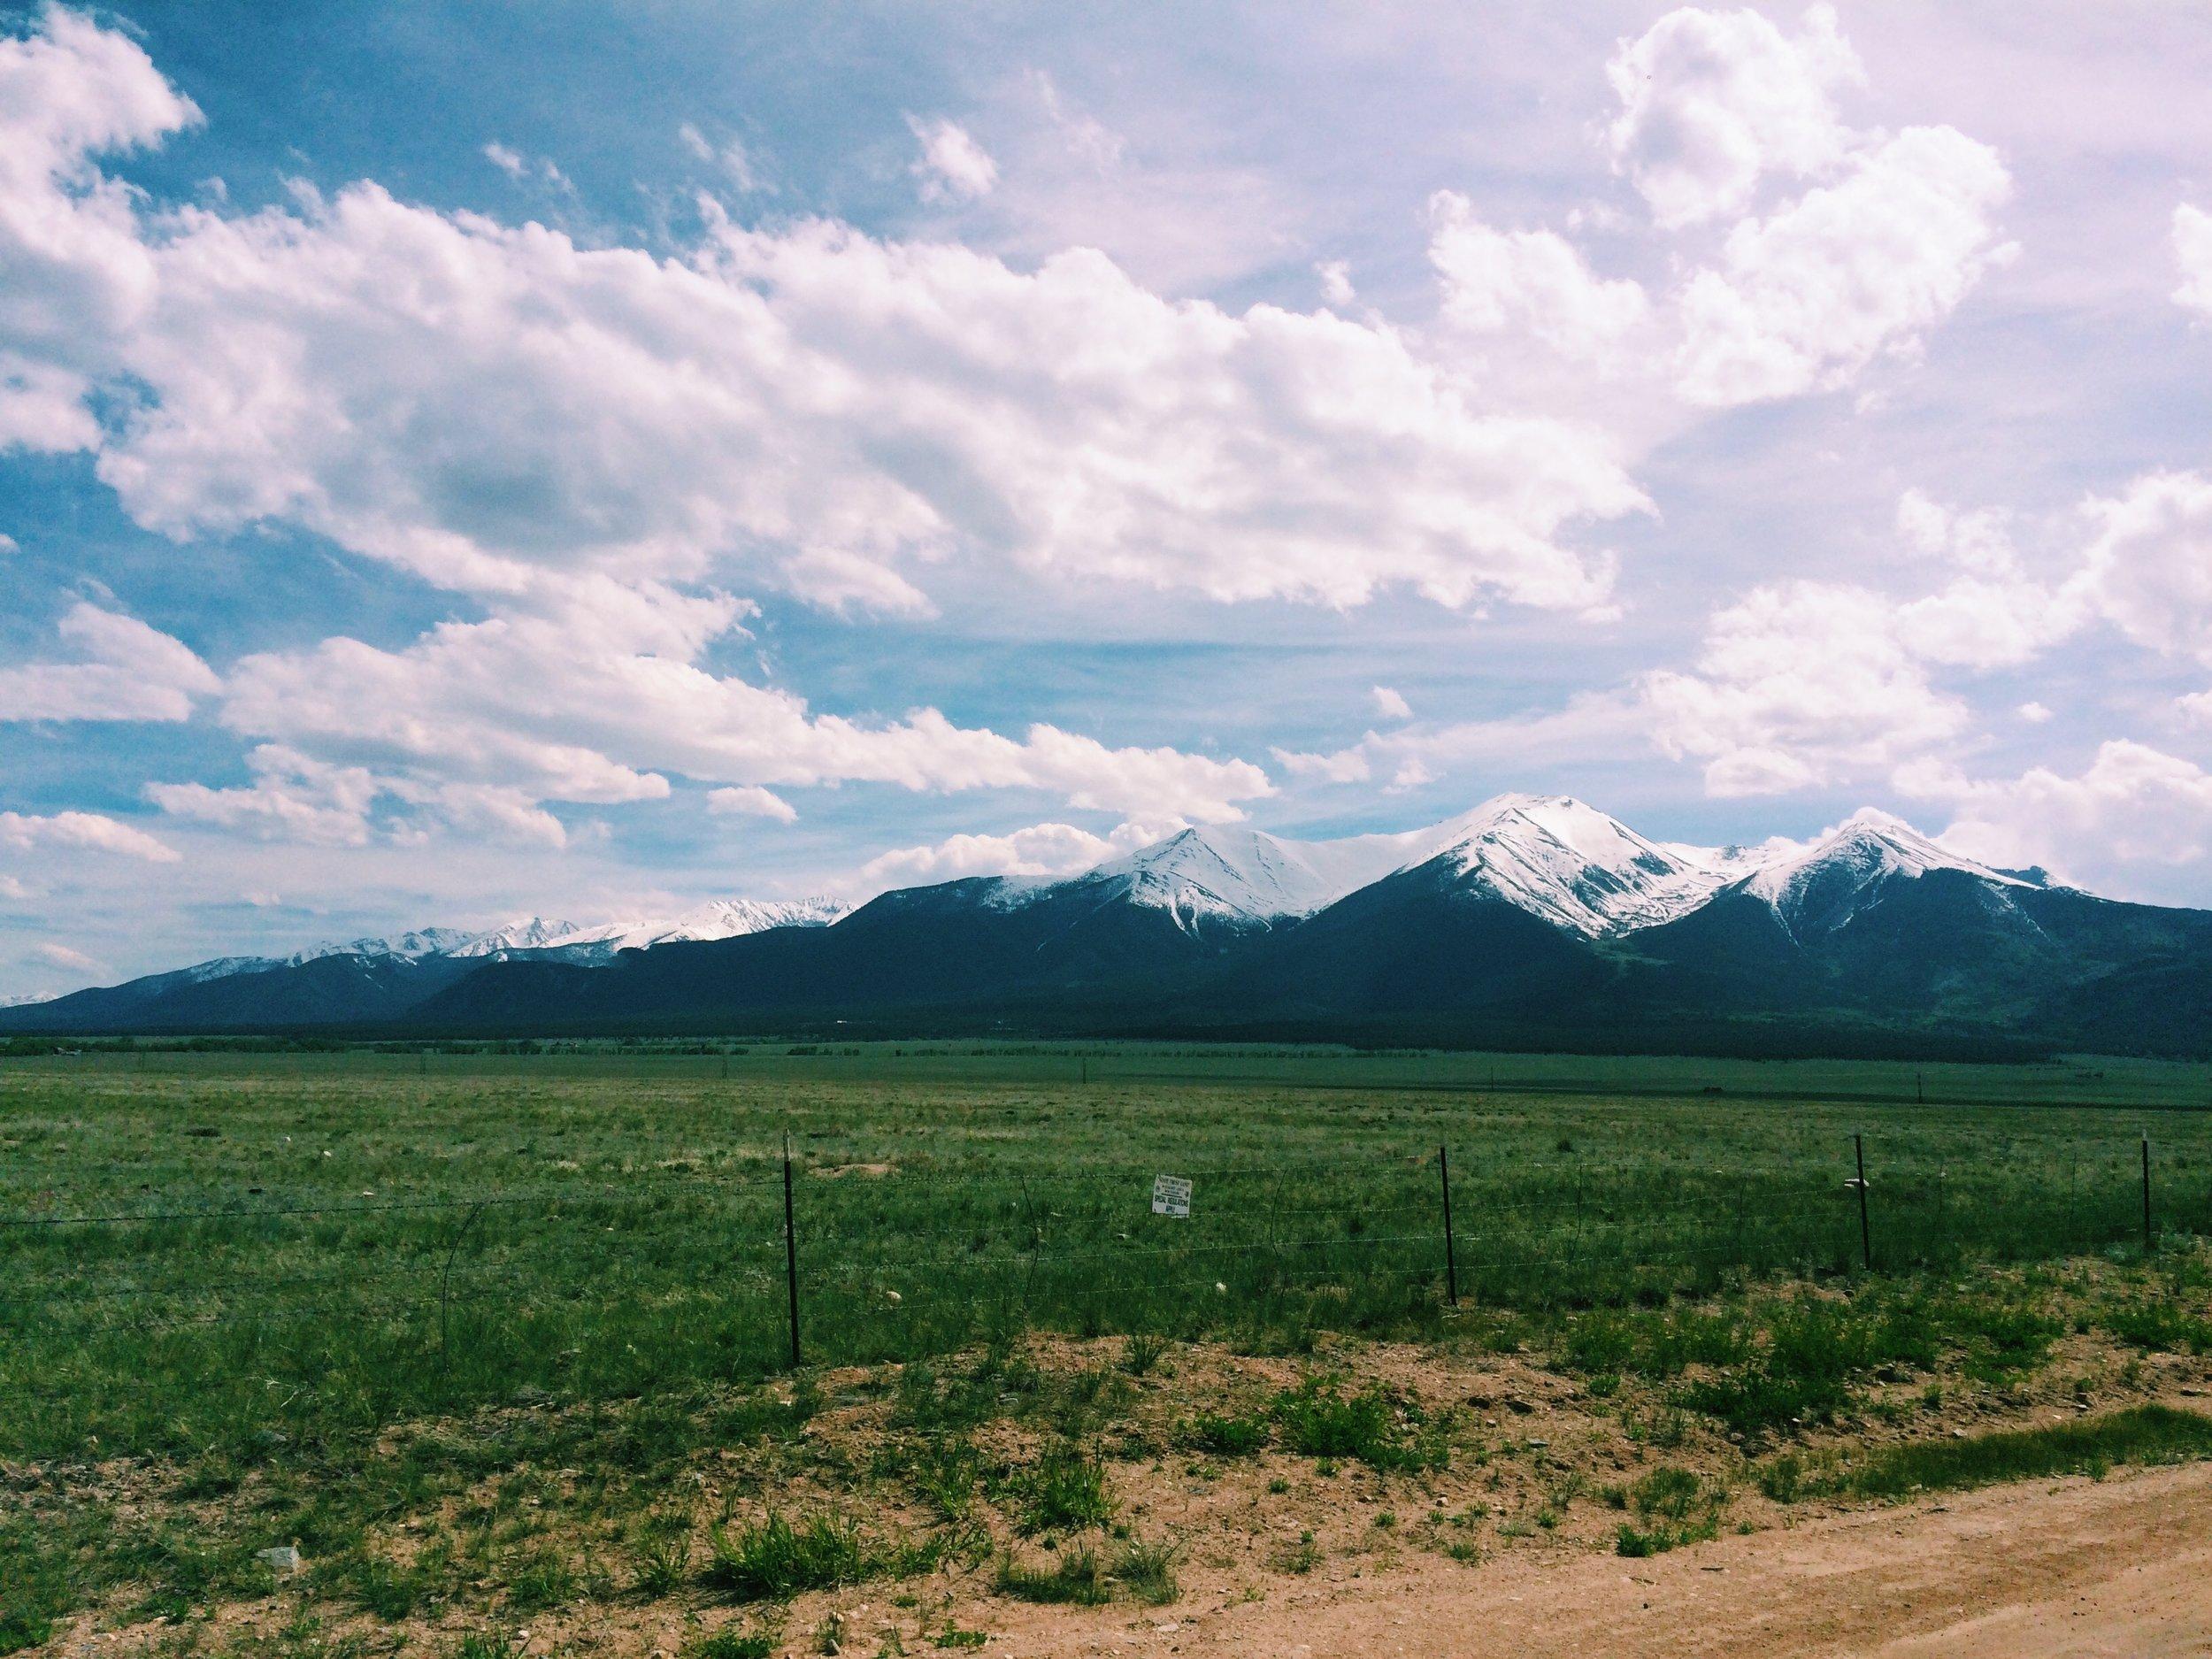 shoutout my iPhone (also hi Colorado miss u)